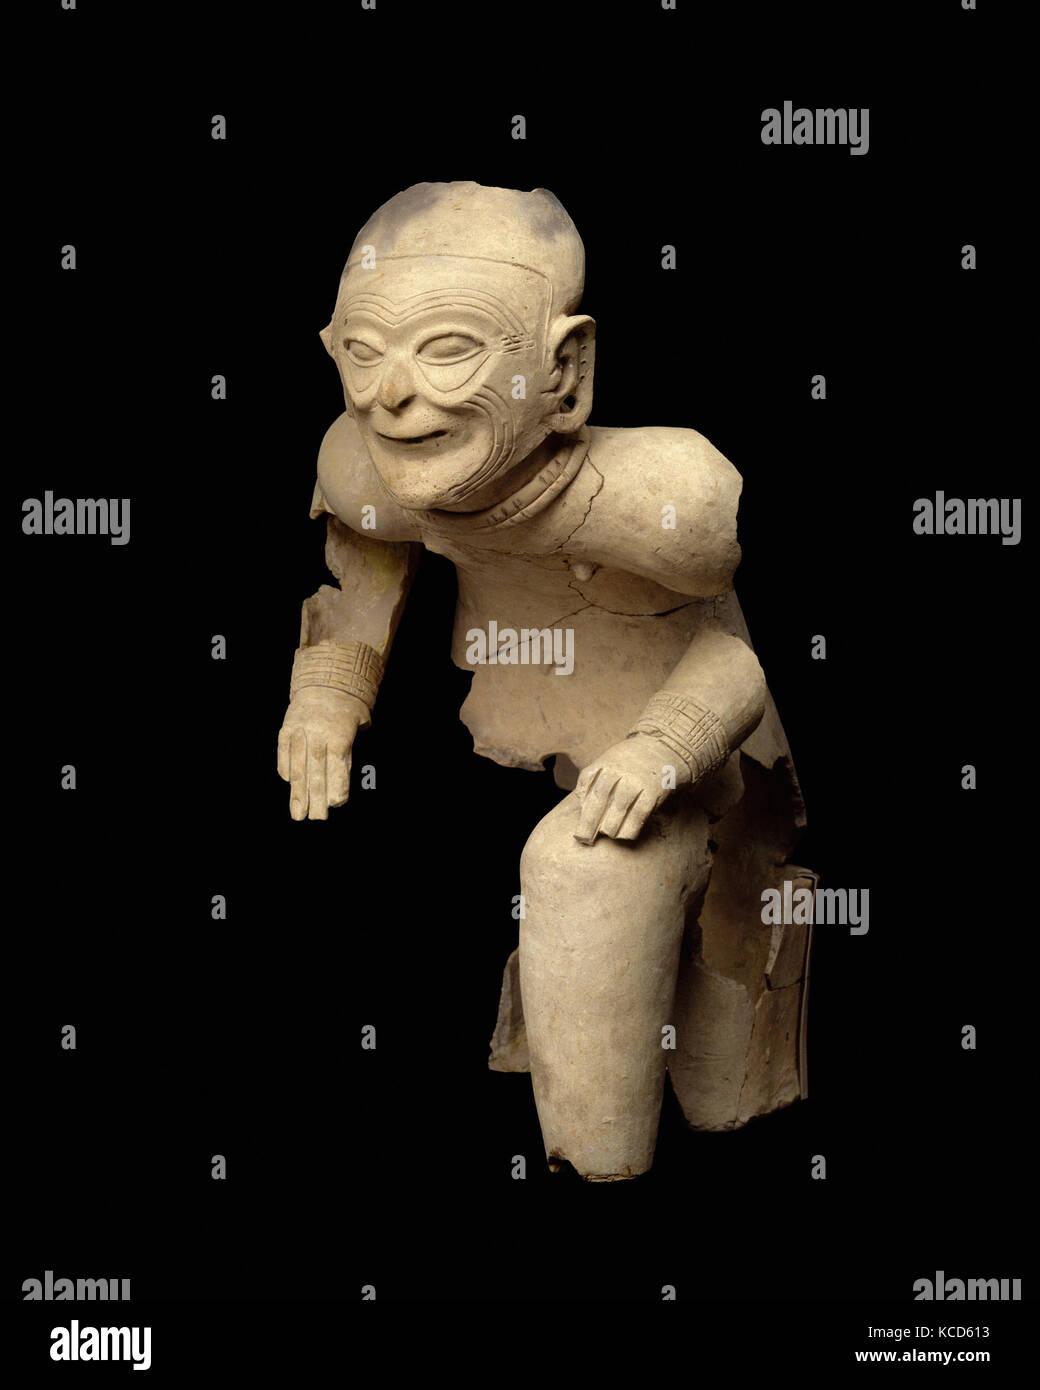 Seated Figure, 1st century B.C.–A.D. 1st century, Colombia or Ecuador, Tolita-Tumaco, Ceramic, H. 25 x W. 14 1/2 - Stock Image